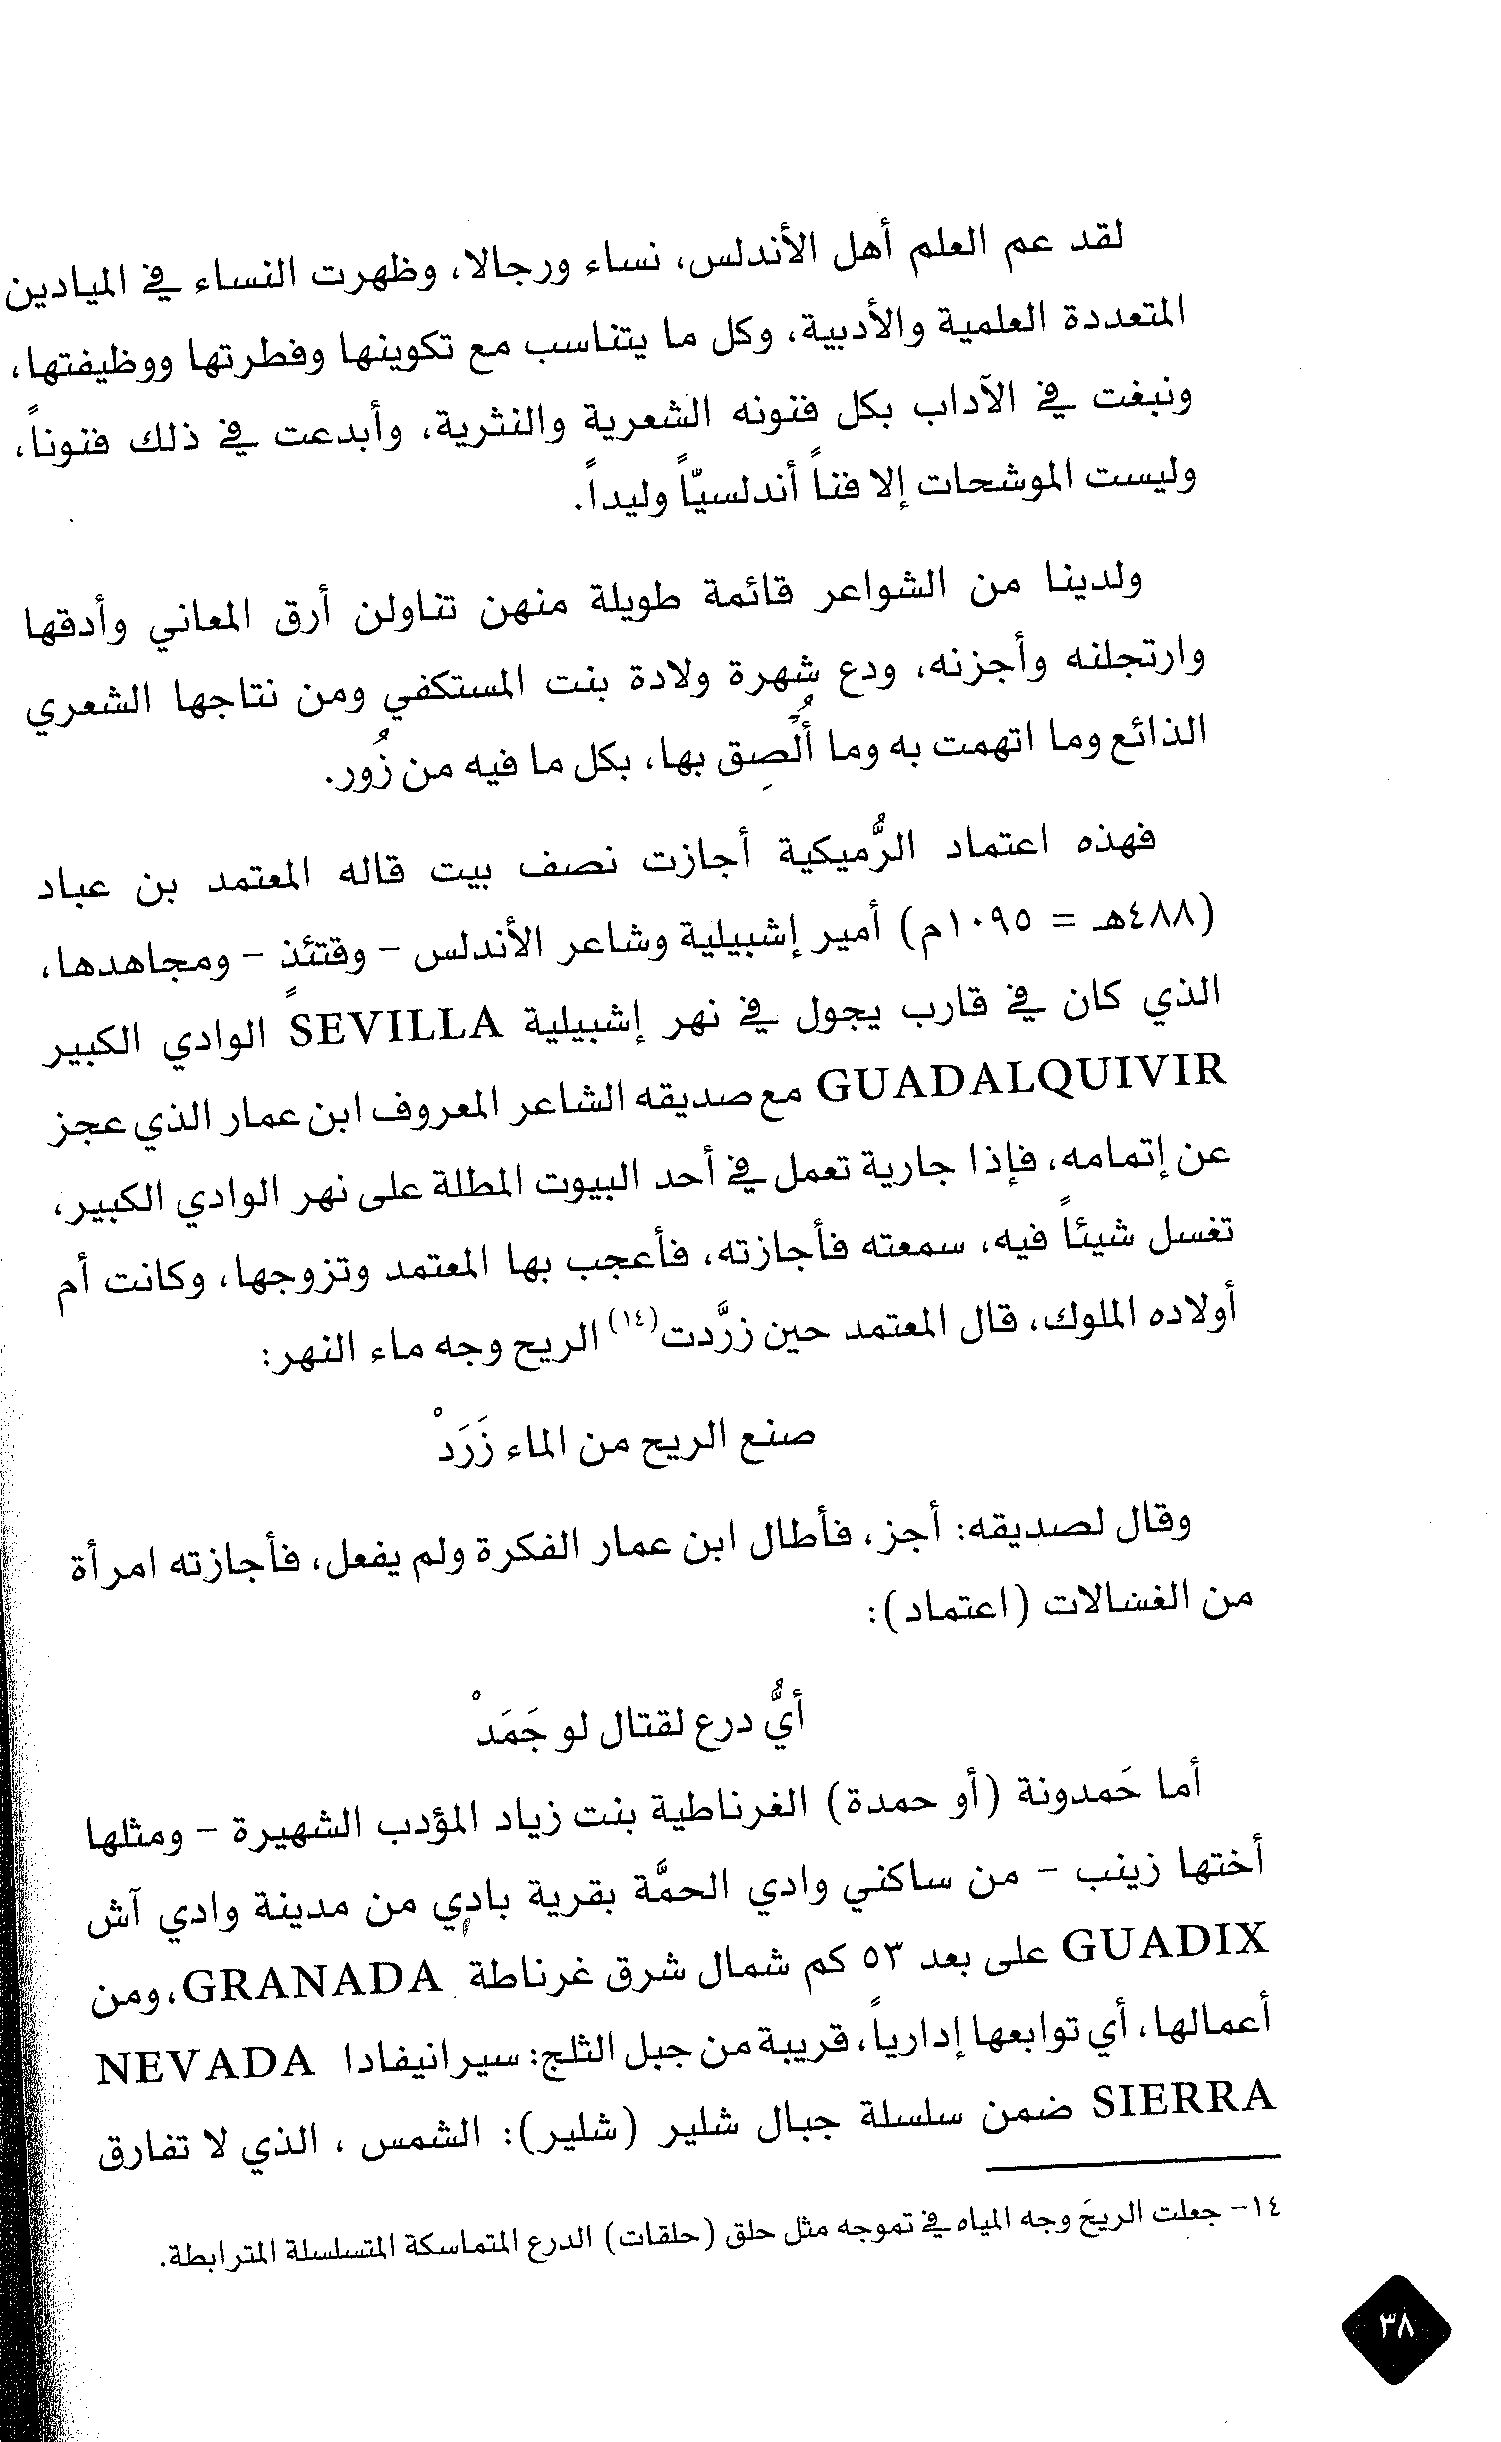 Pin by DR. NAJEEB ALREFAE on حكايات الاندلس Math, Math